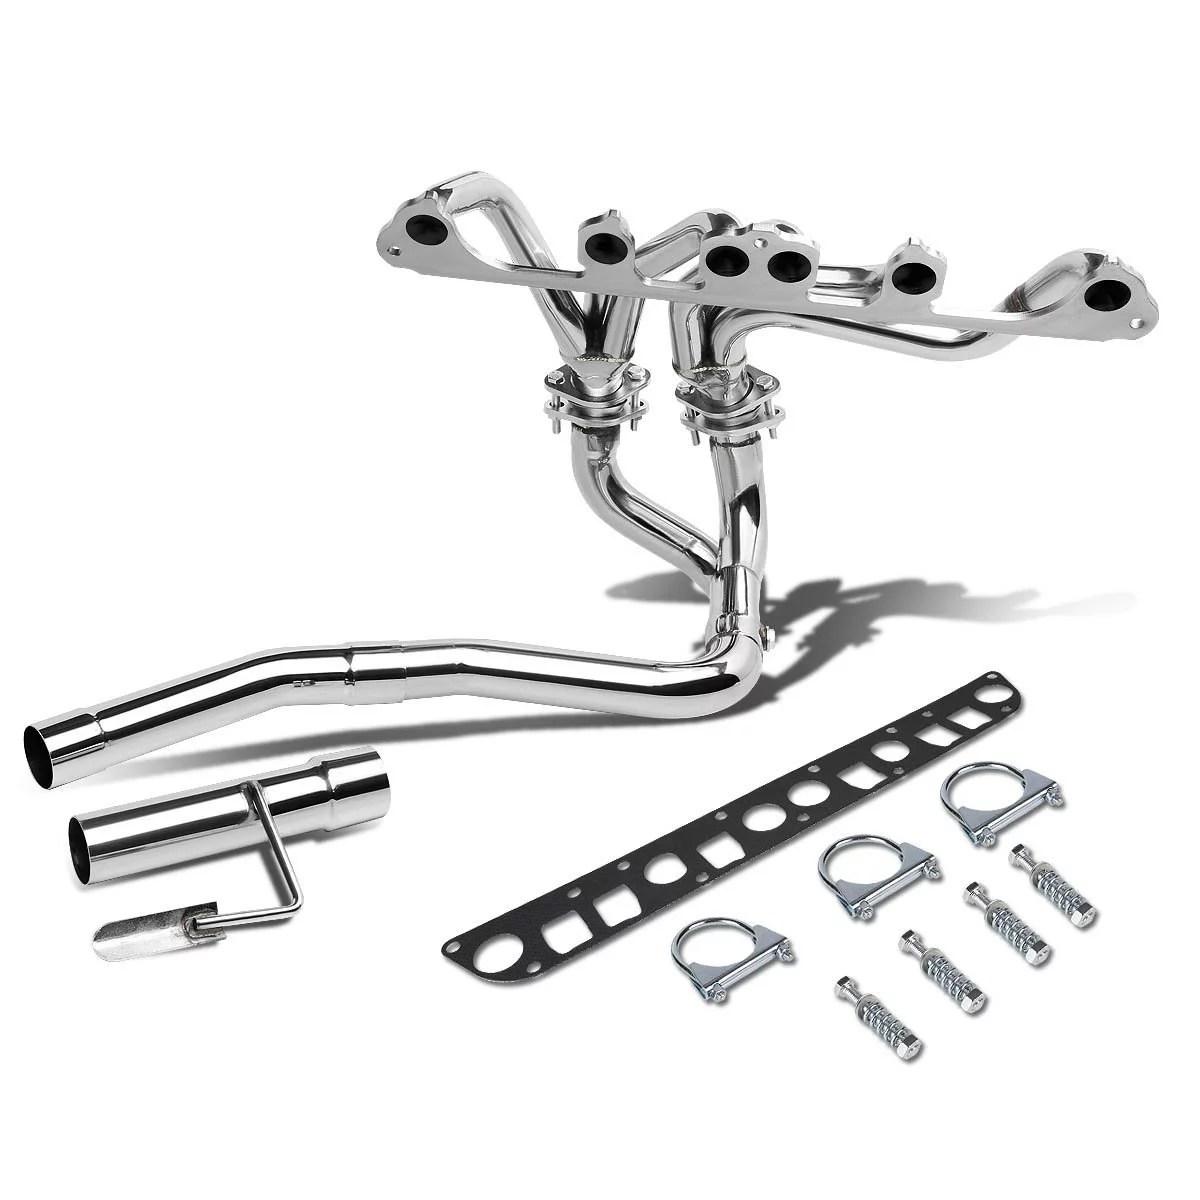 hight resolution of for 91 99 jeep wrangler yj tj 4 0l l6 chrome 4 2 1 tri y performance header exhaust manifold walmart com